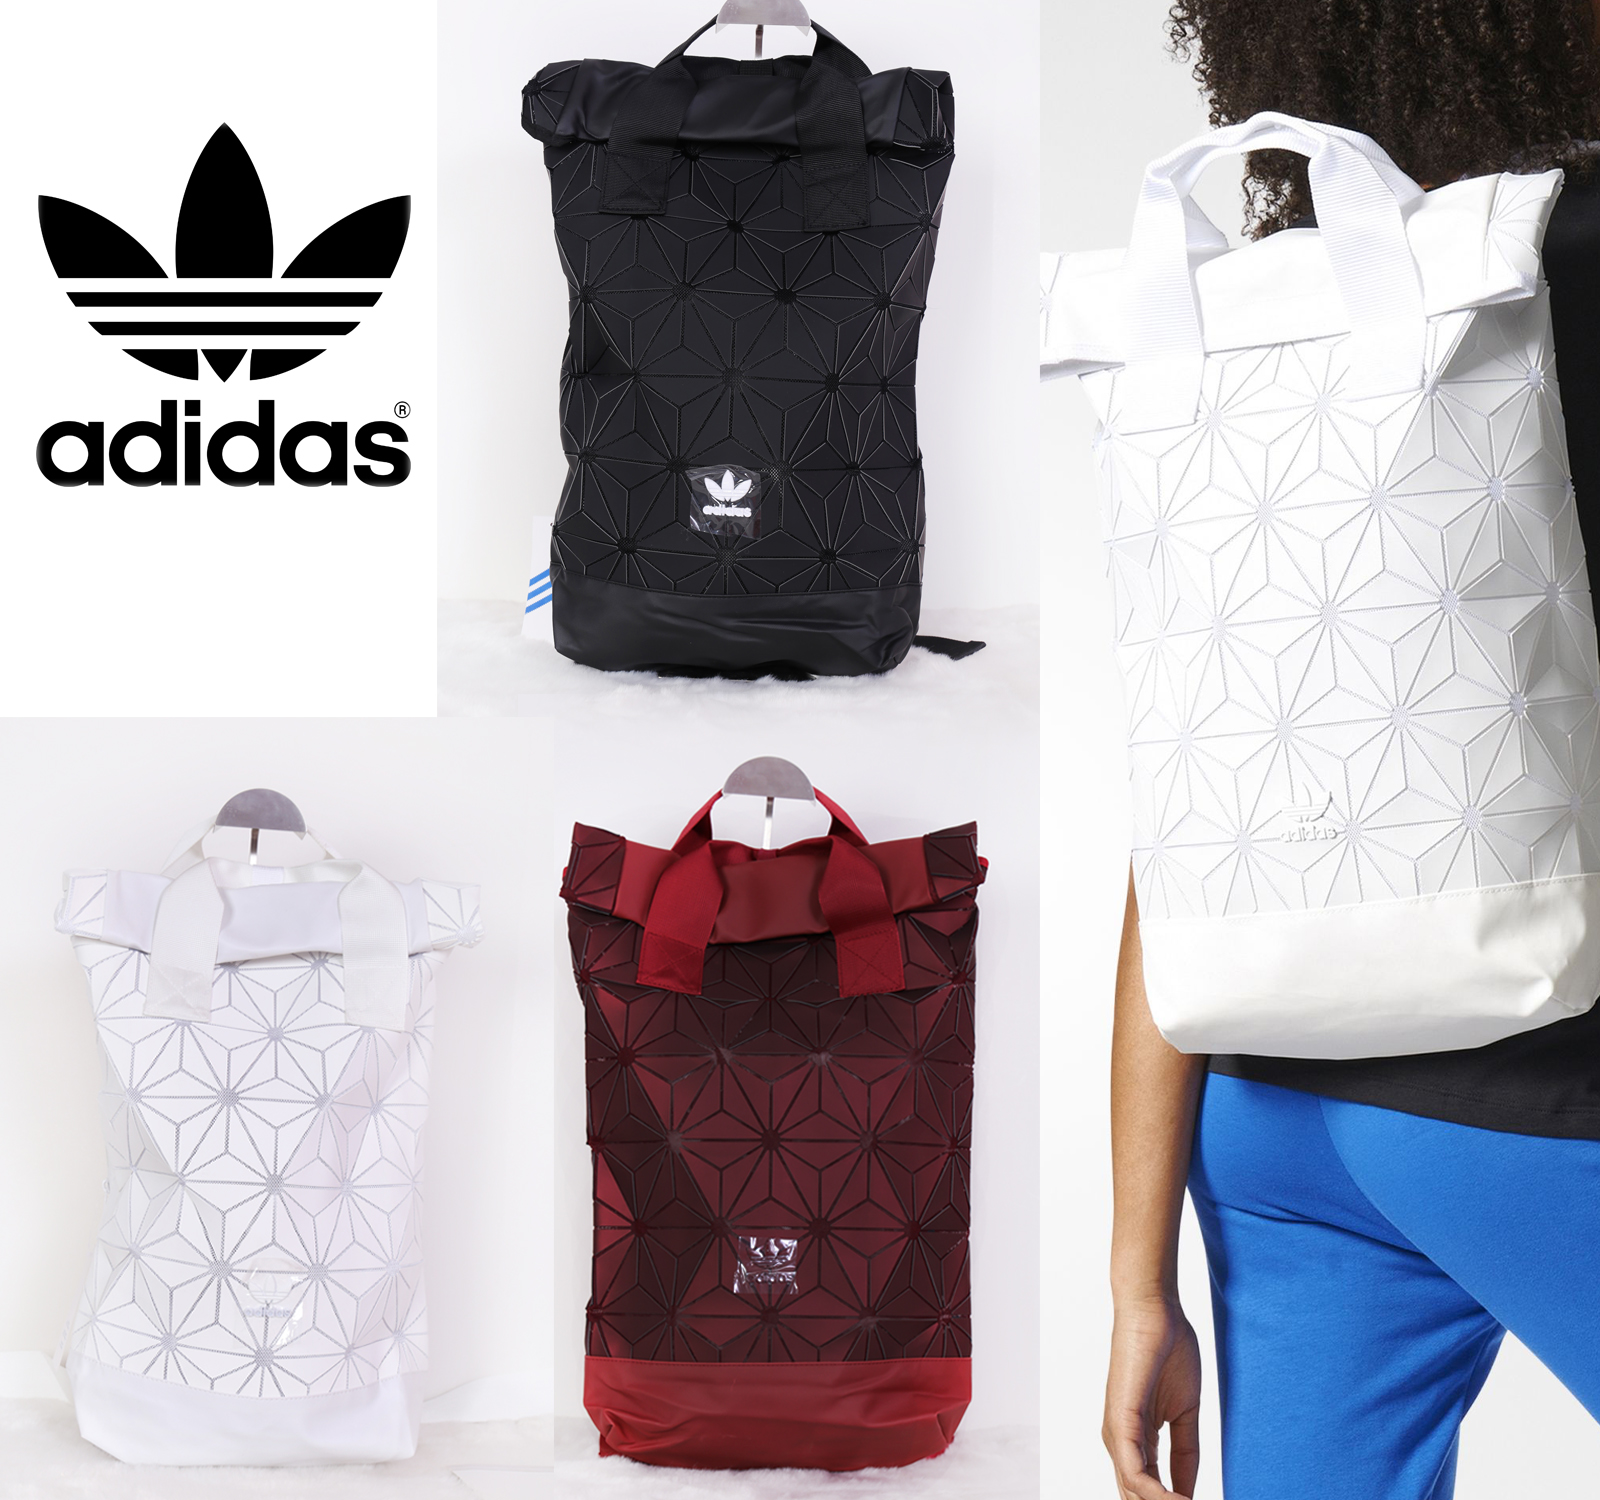 Adidas Originals Adidas BP Top Roll bolsa Top 3D Mesh 2017 negro mochila bolsa hacer ca41427 - allpoints.host